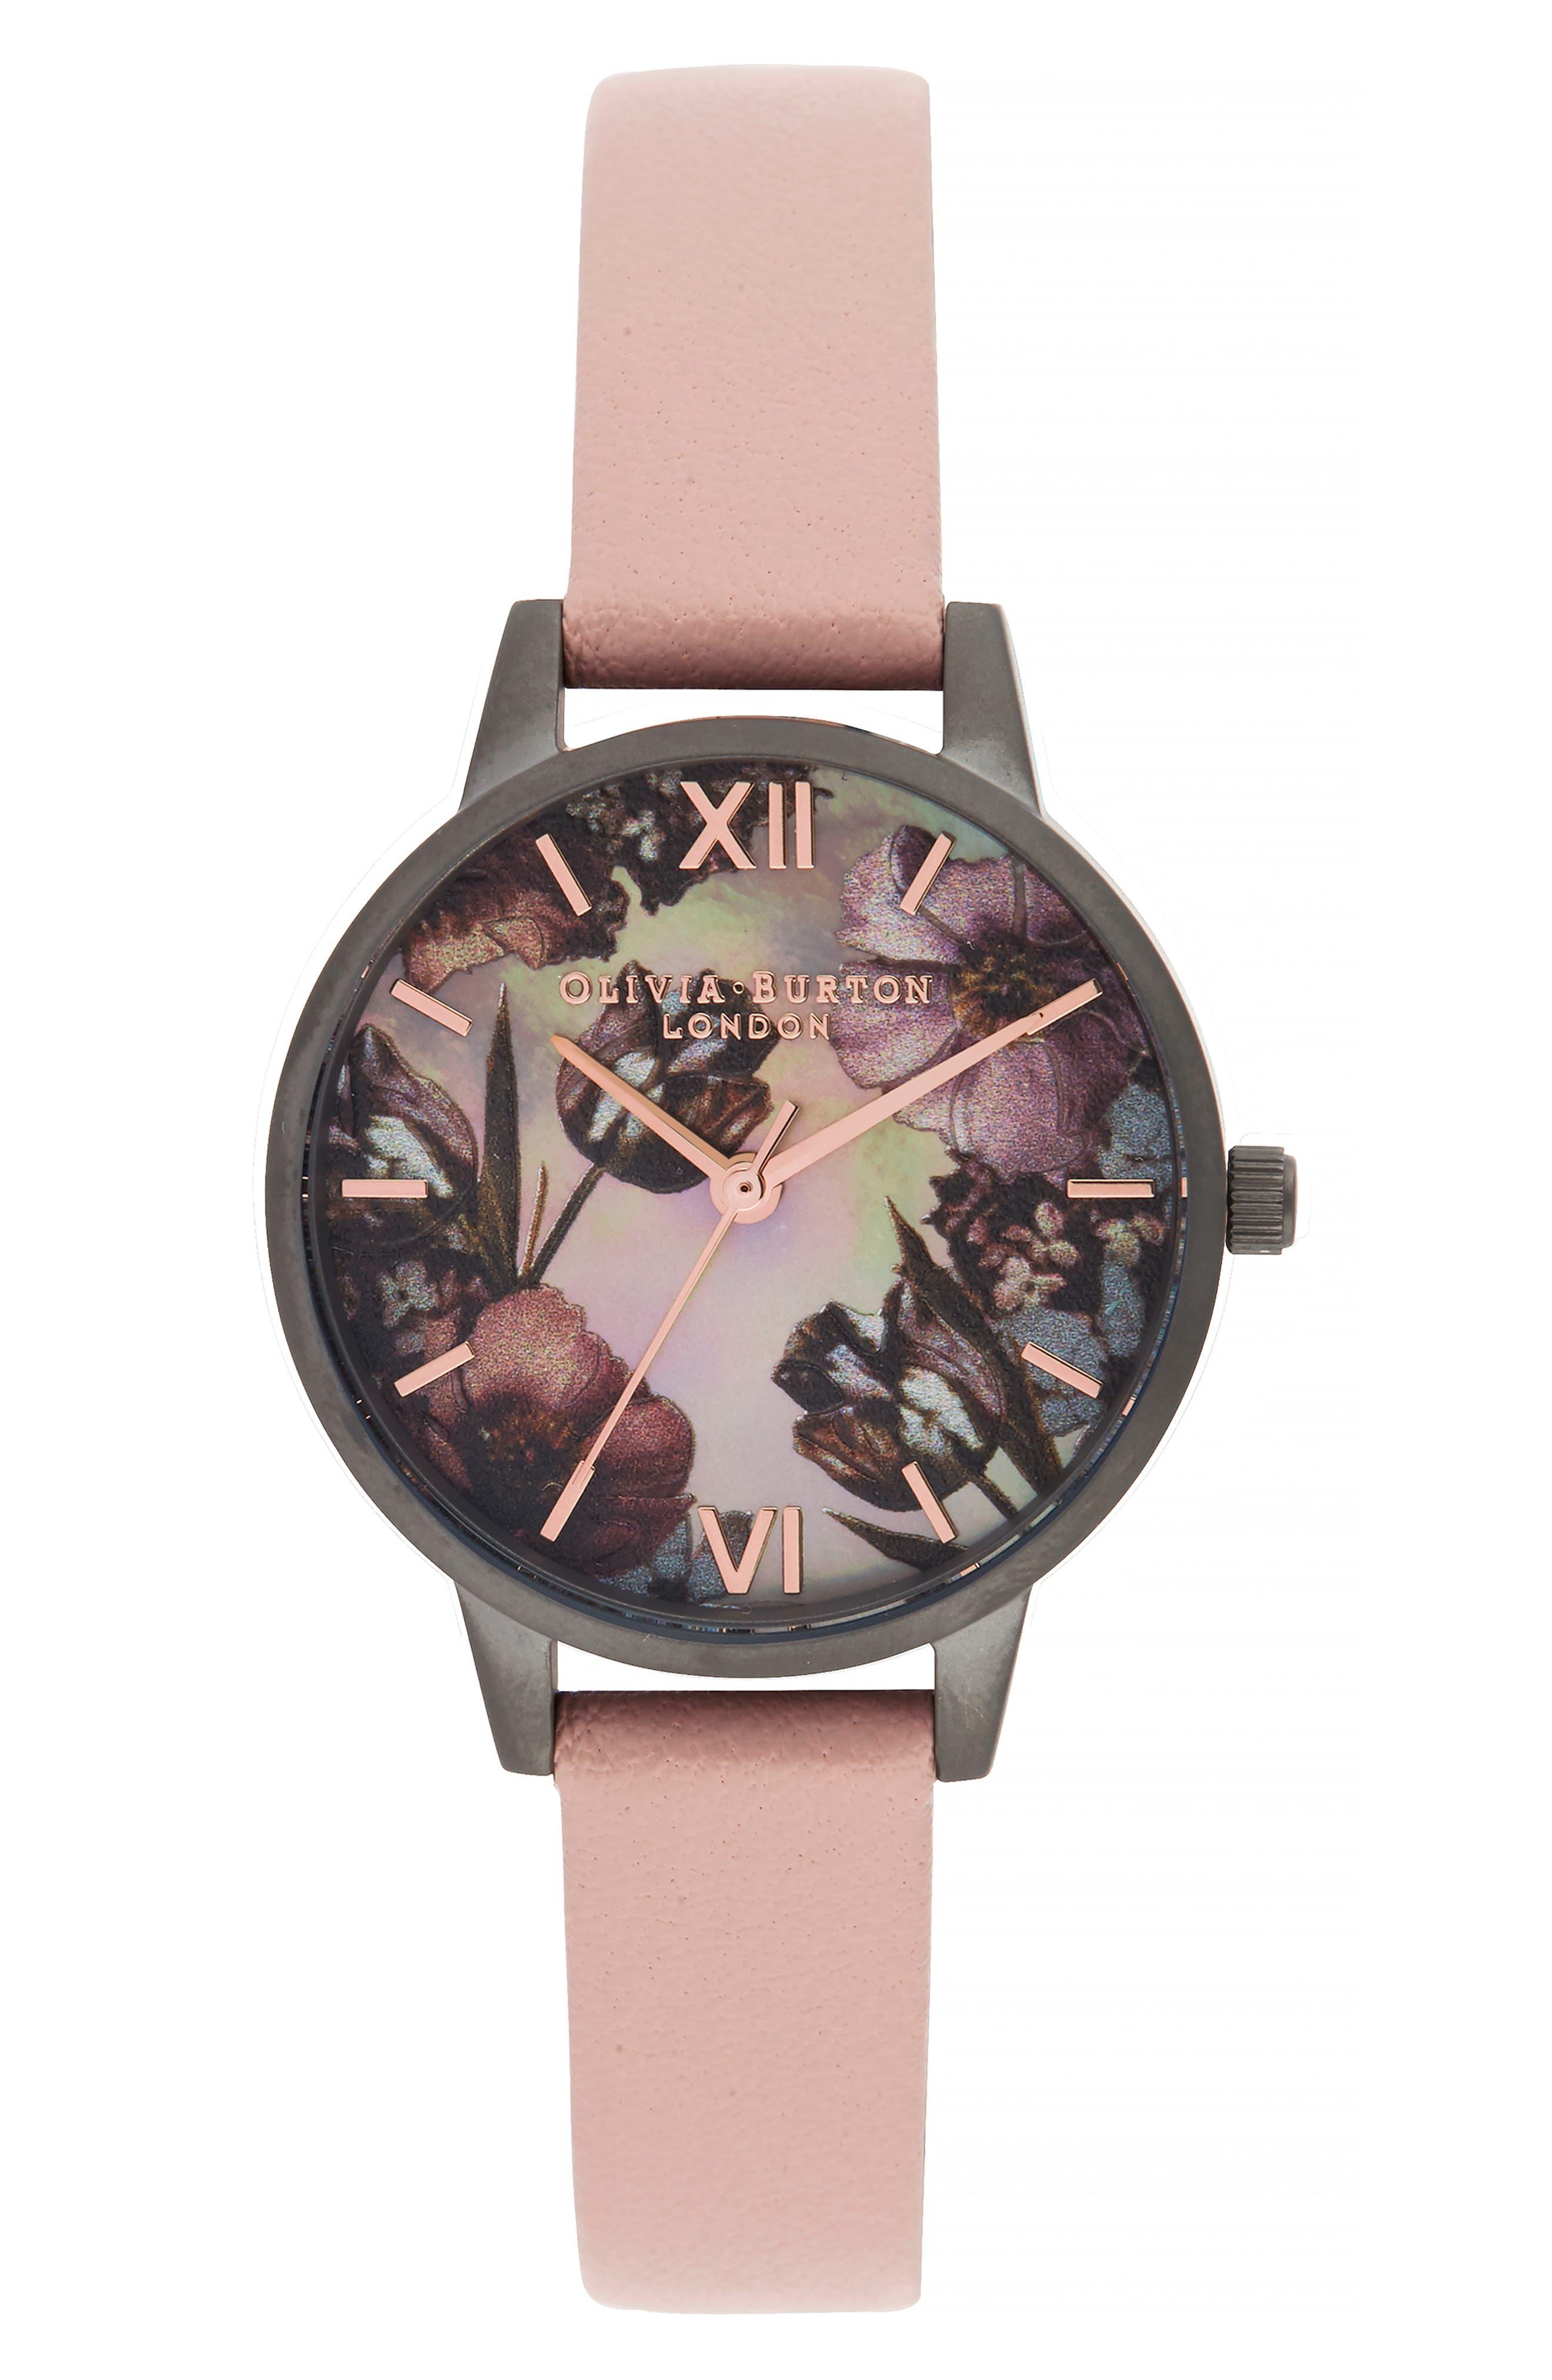 OLIVIA BURTON, Twilight Leather Strap Watch, 30mm, Main thumbnail 1, color, 650